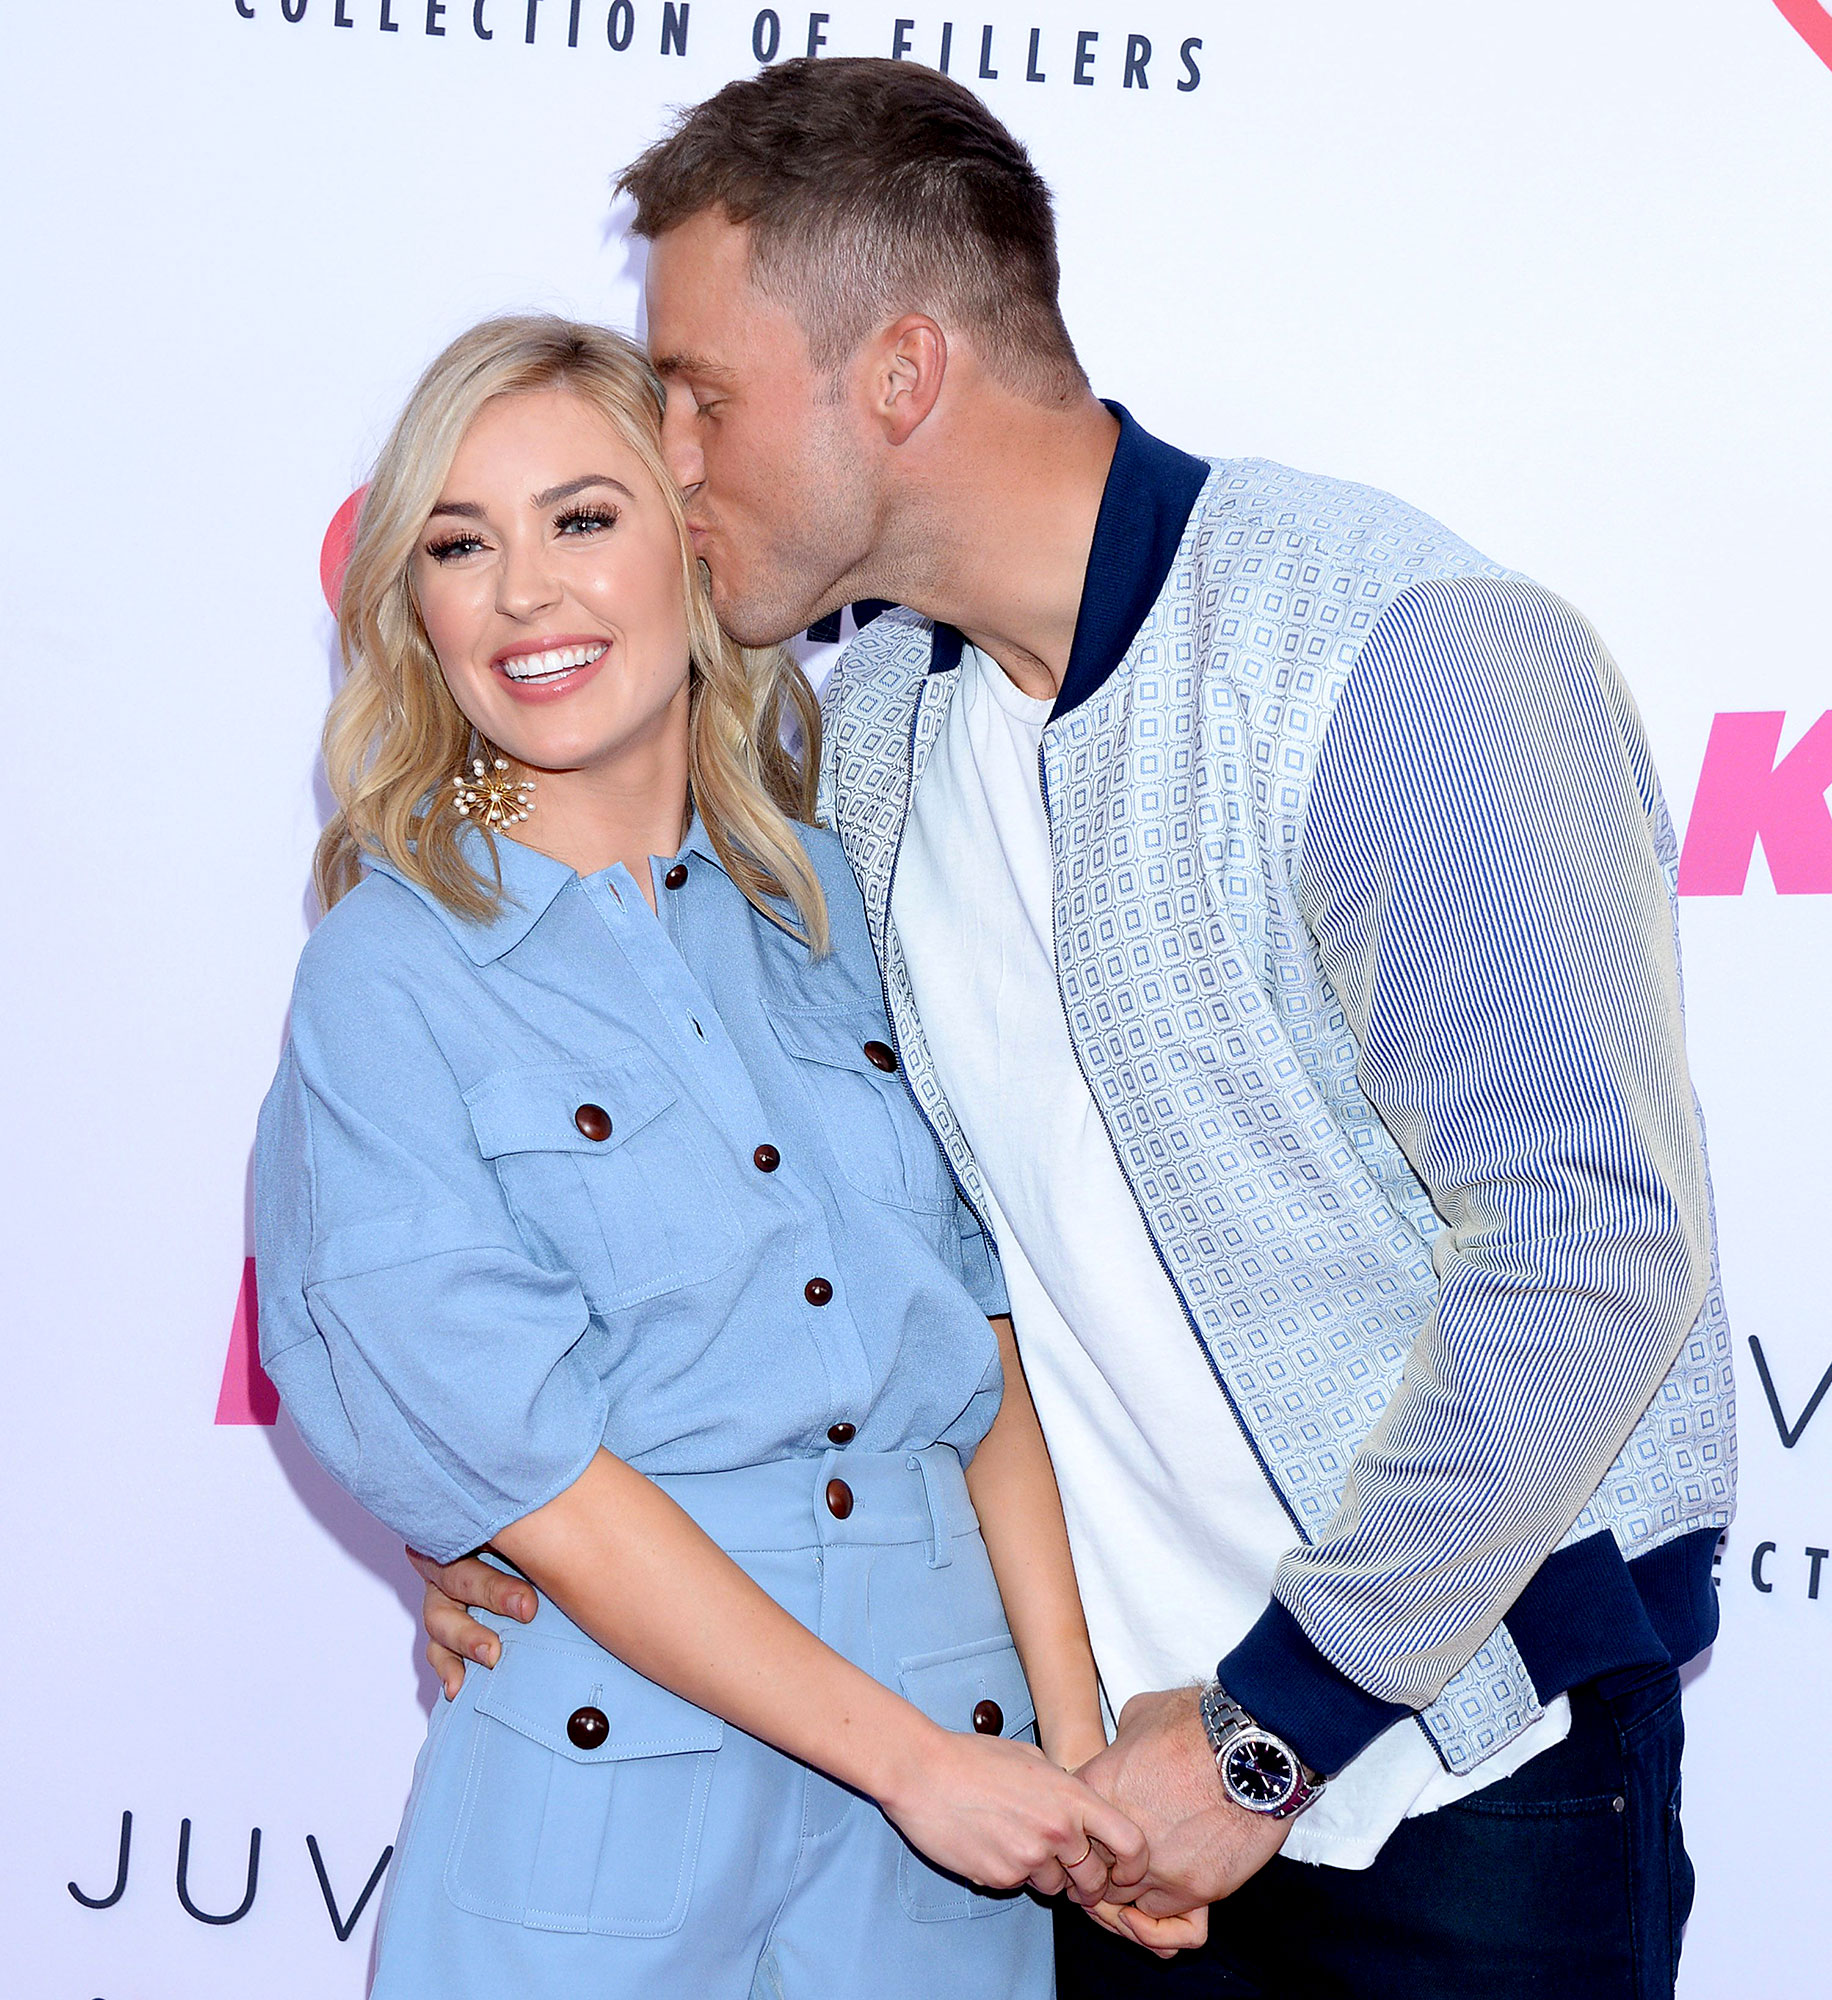 Colton Underwood and Cassie Randolph Are Still Together Despite Split Rumors Kiss